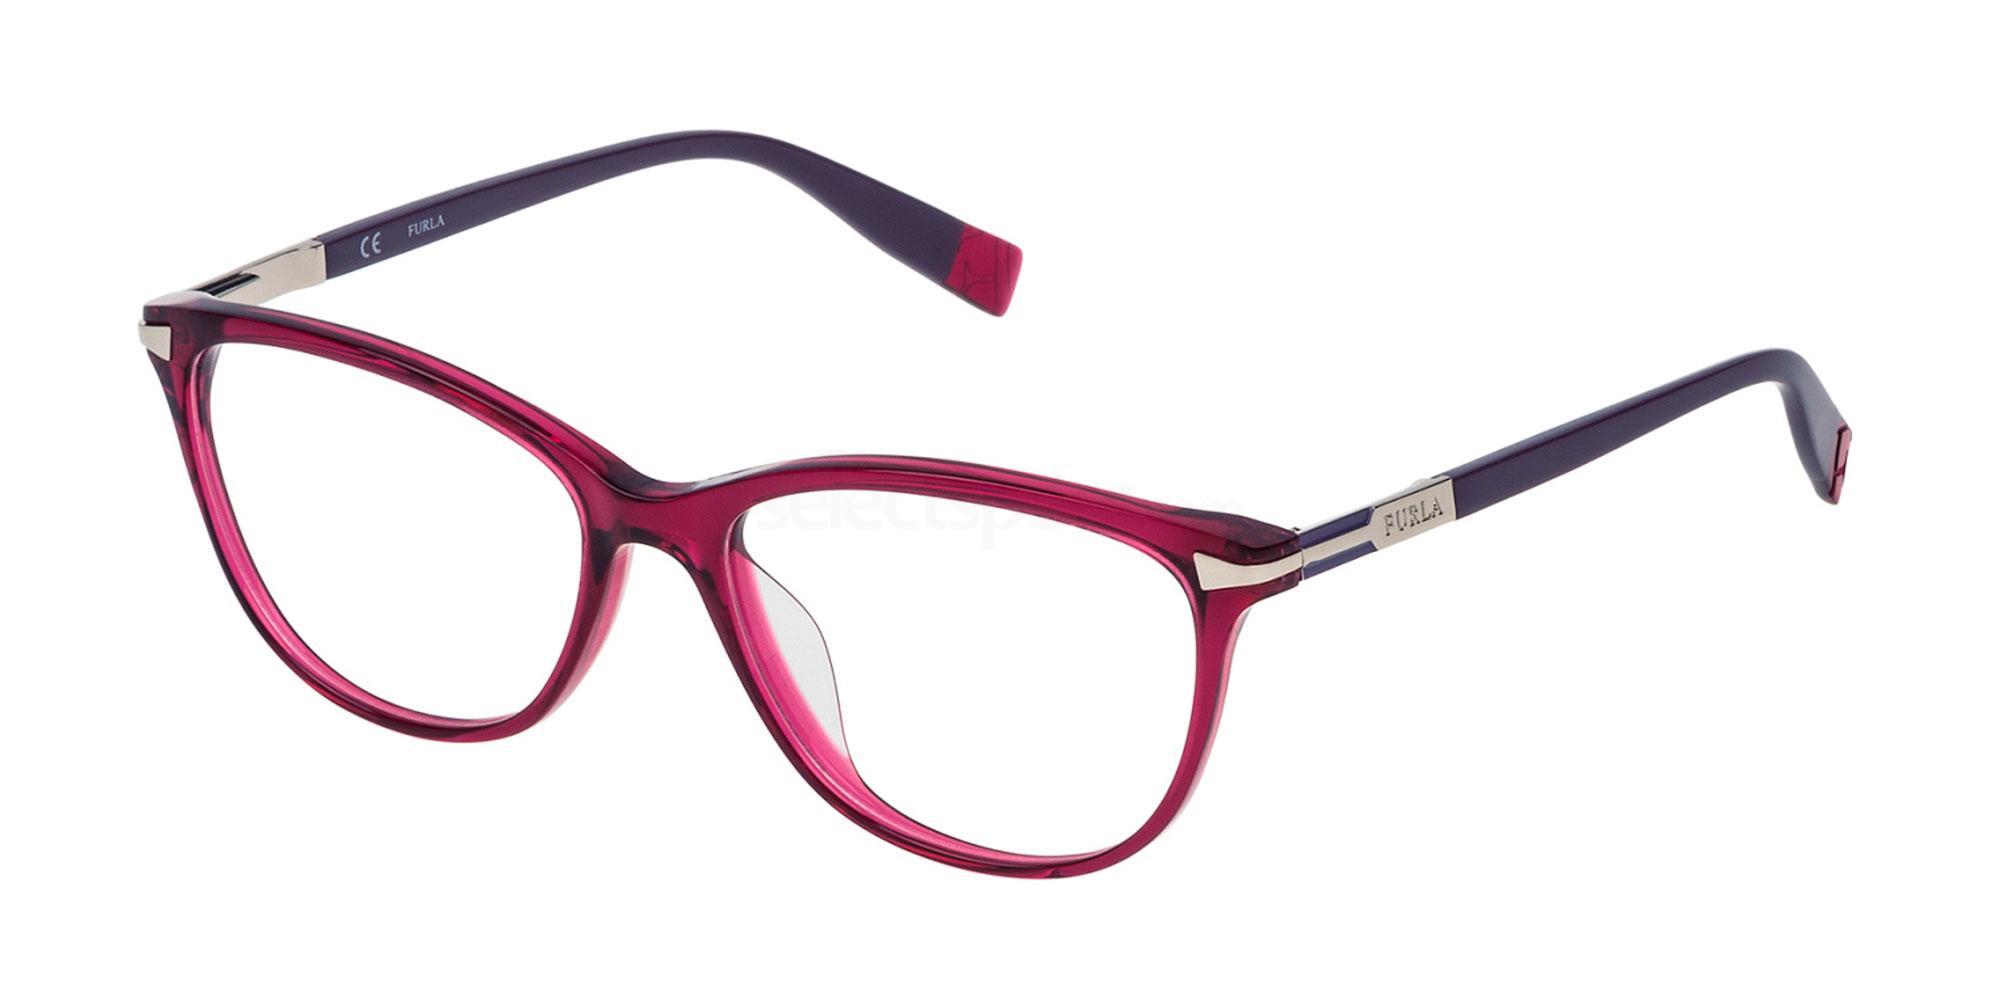 01BV VFU025 Glasses, Furla